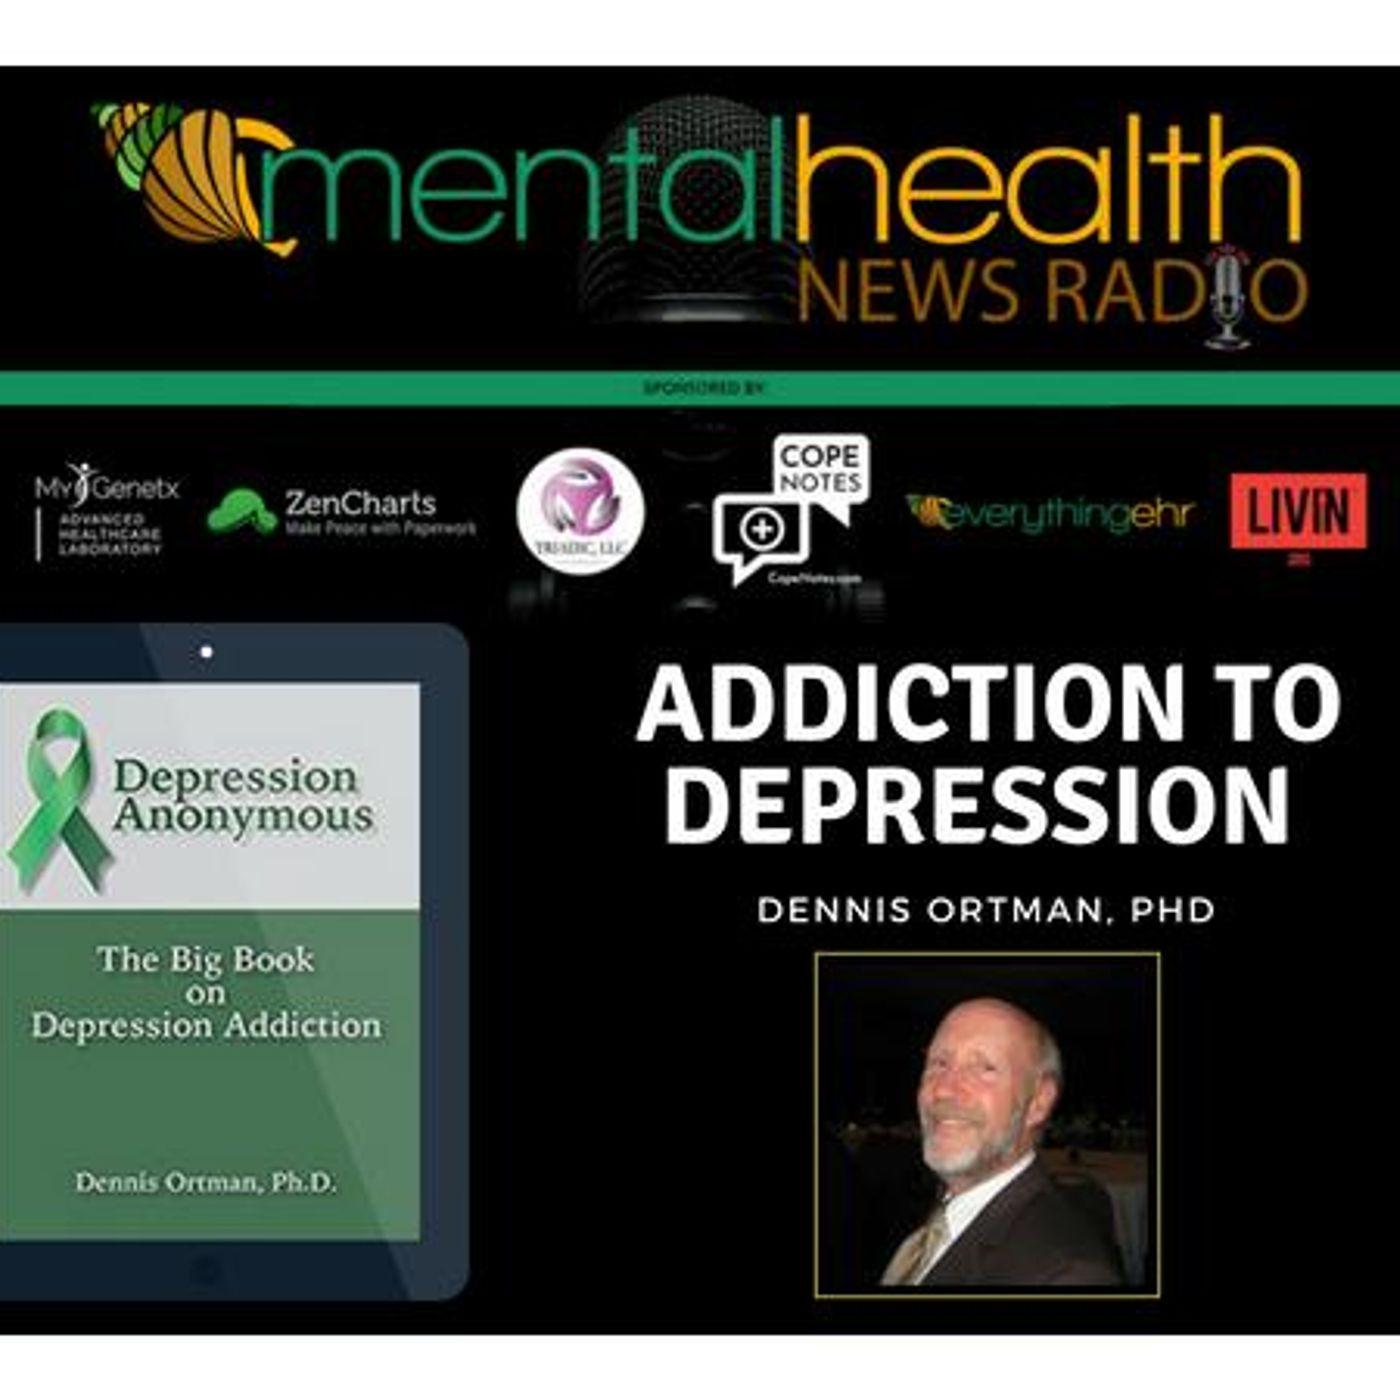 Mental Health News Radio - Addiction to Depression with Dennis Ortman, PhD